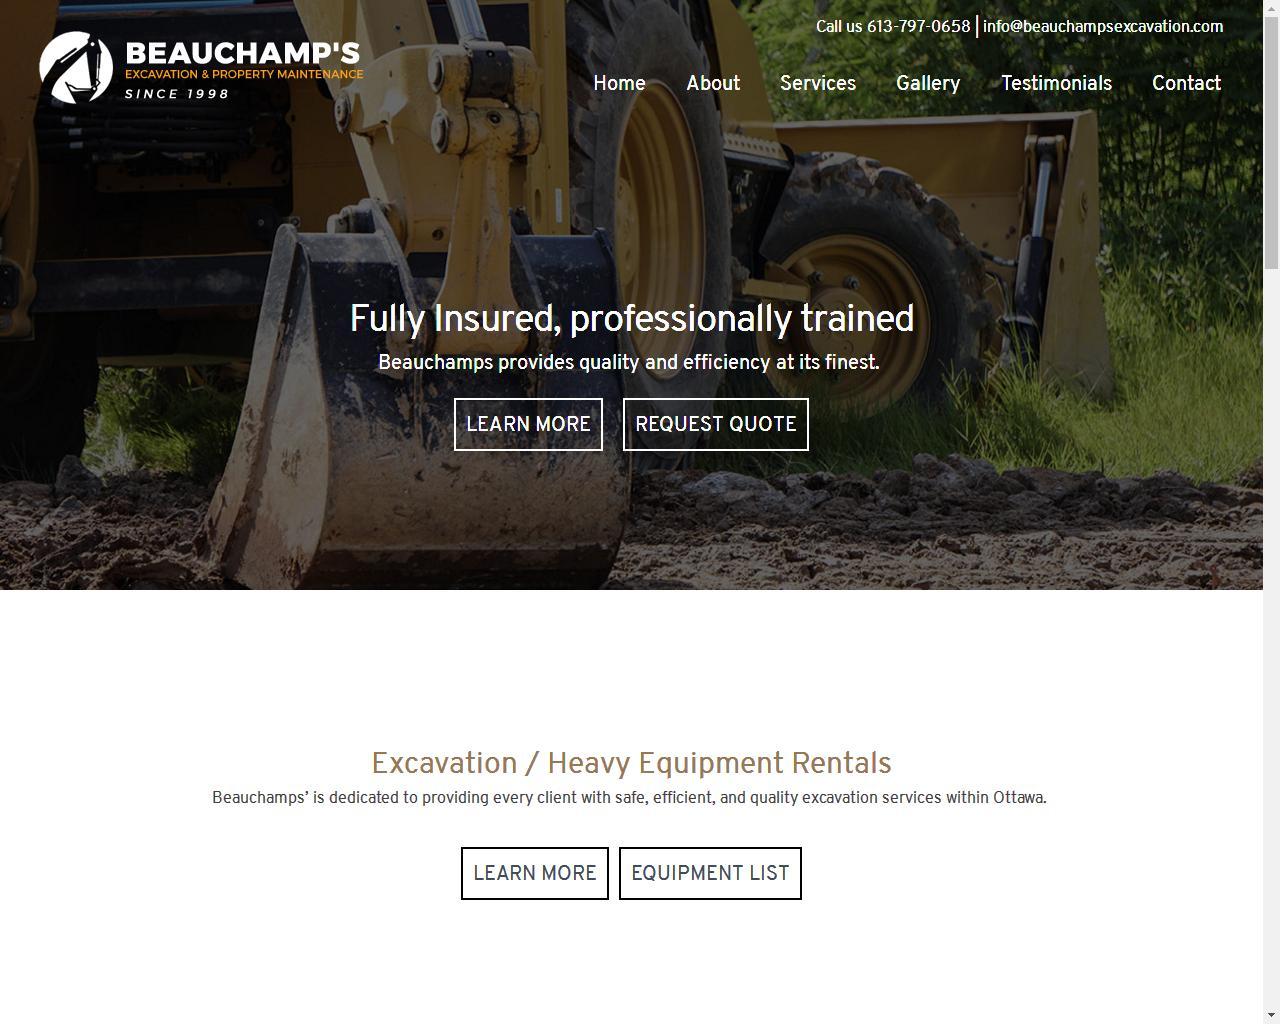 Beauchamp's Building & Property Maintenance